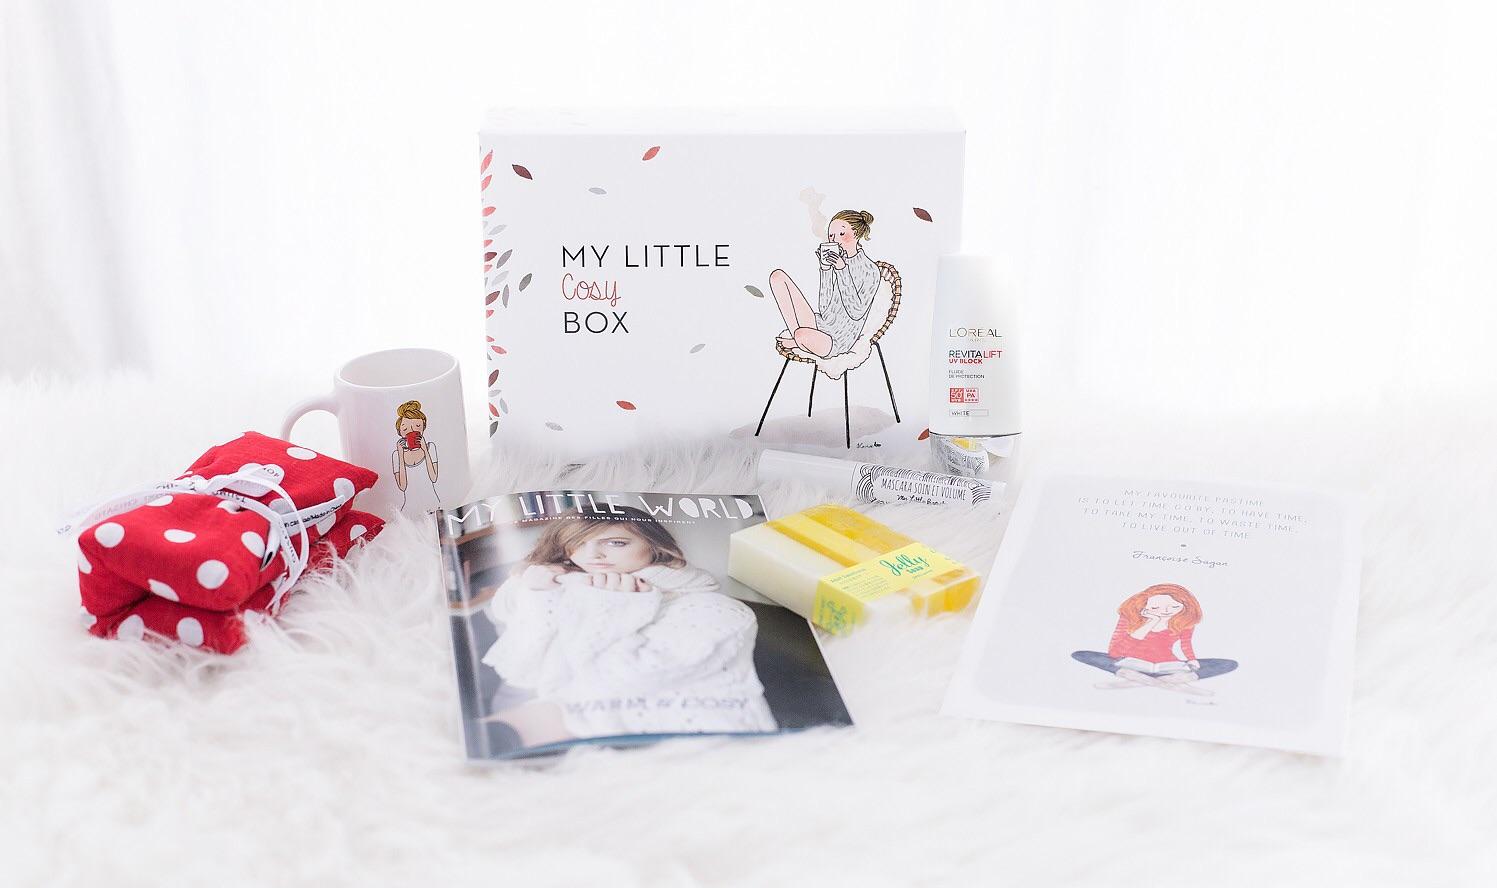 mylittlebox マイリトルボックス